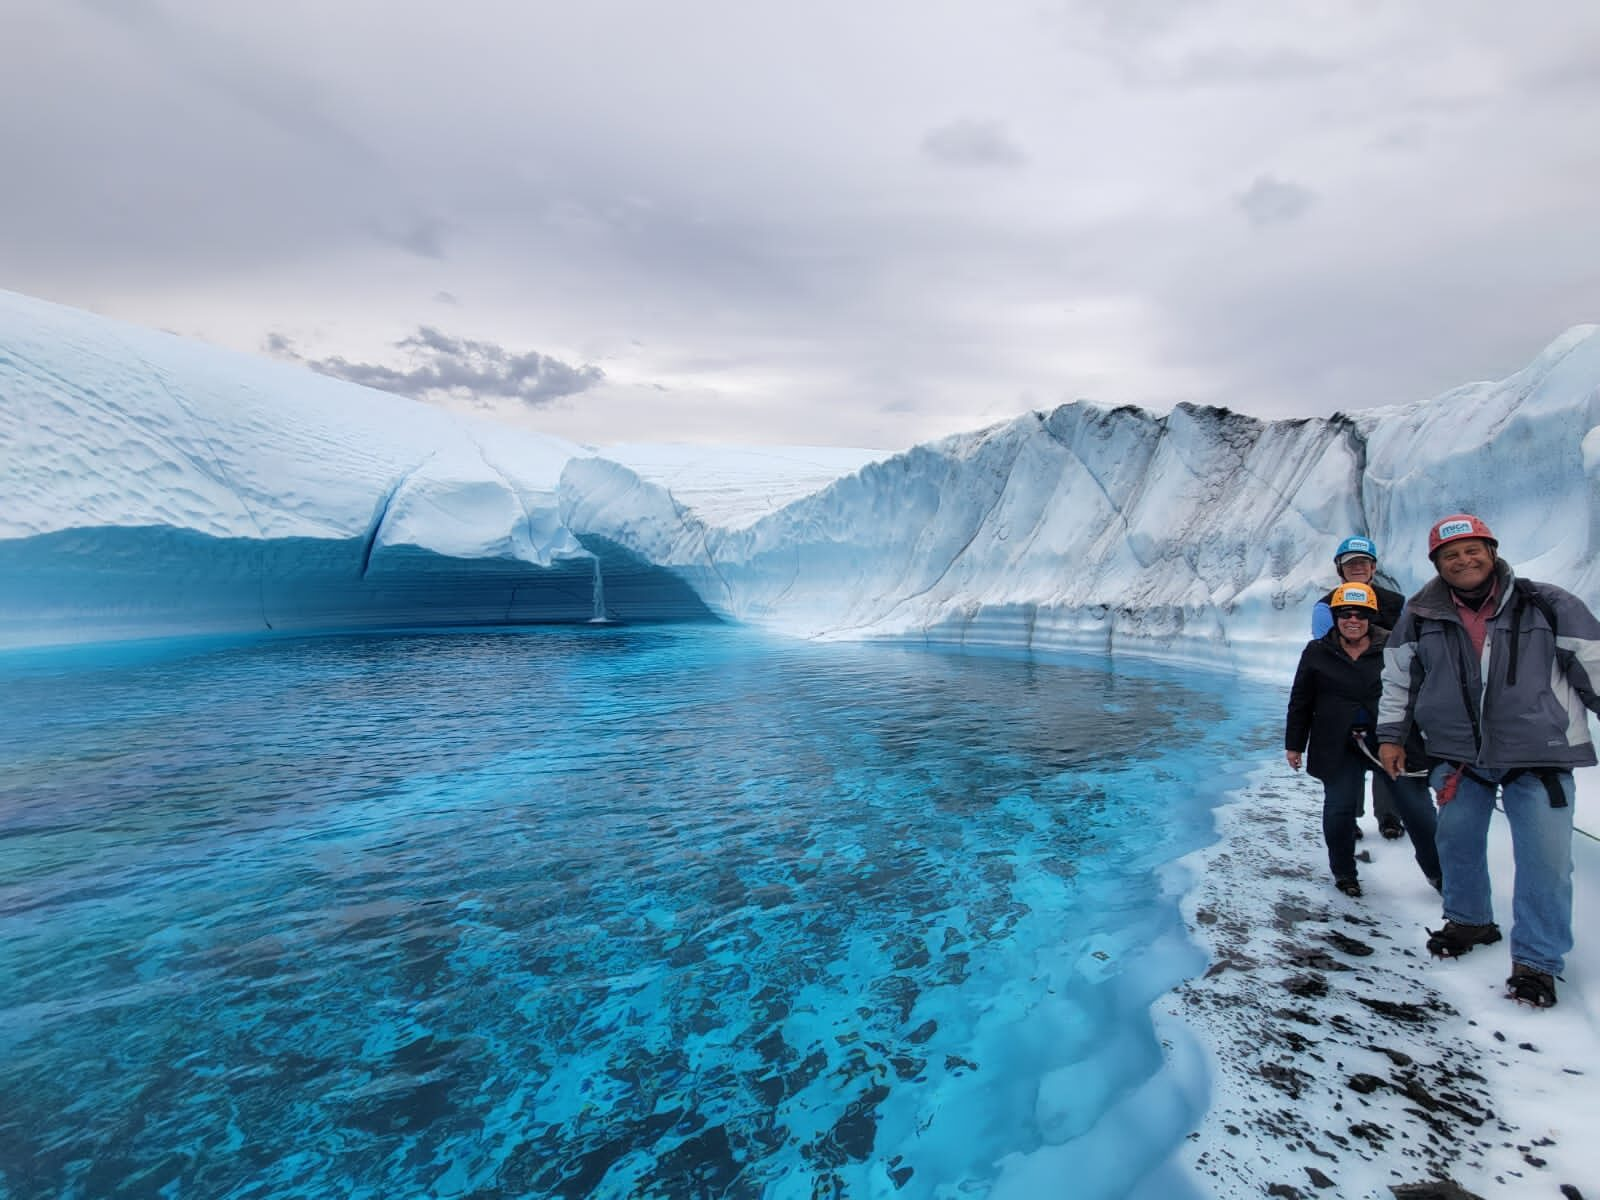 family on ice near blue lake